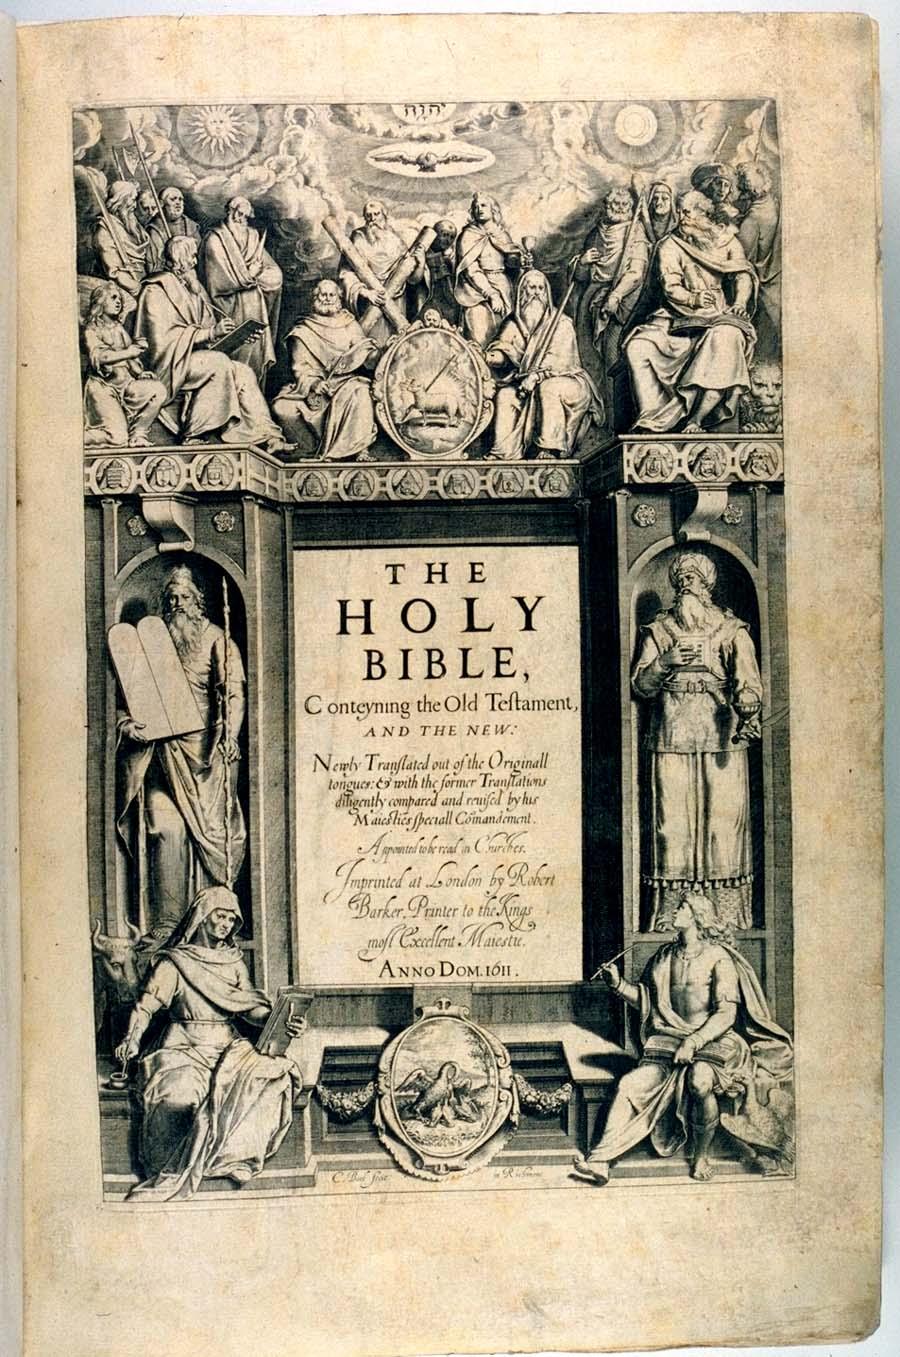 KJV_Bible_1611_Title.jpg